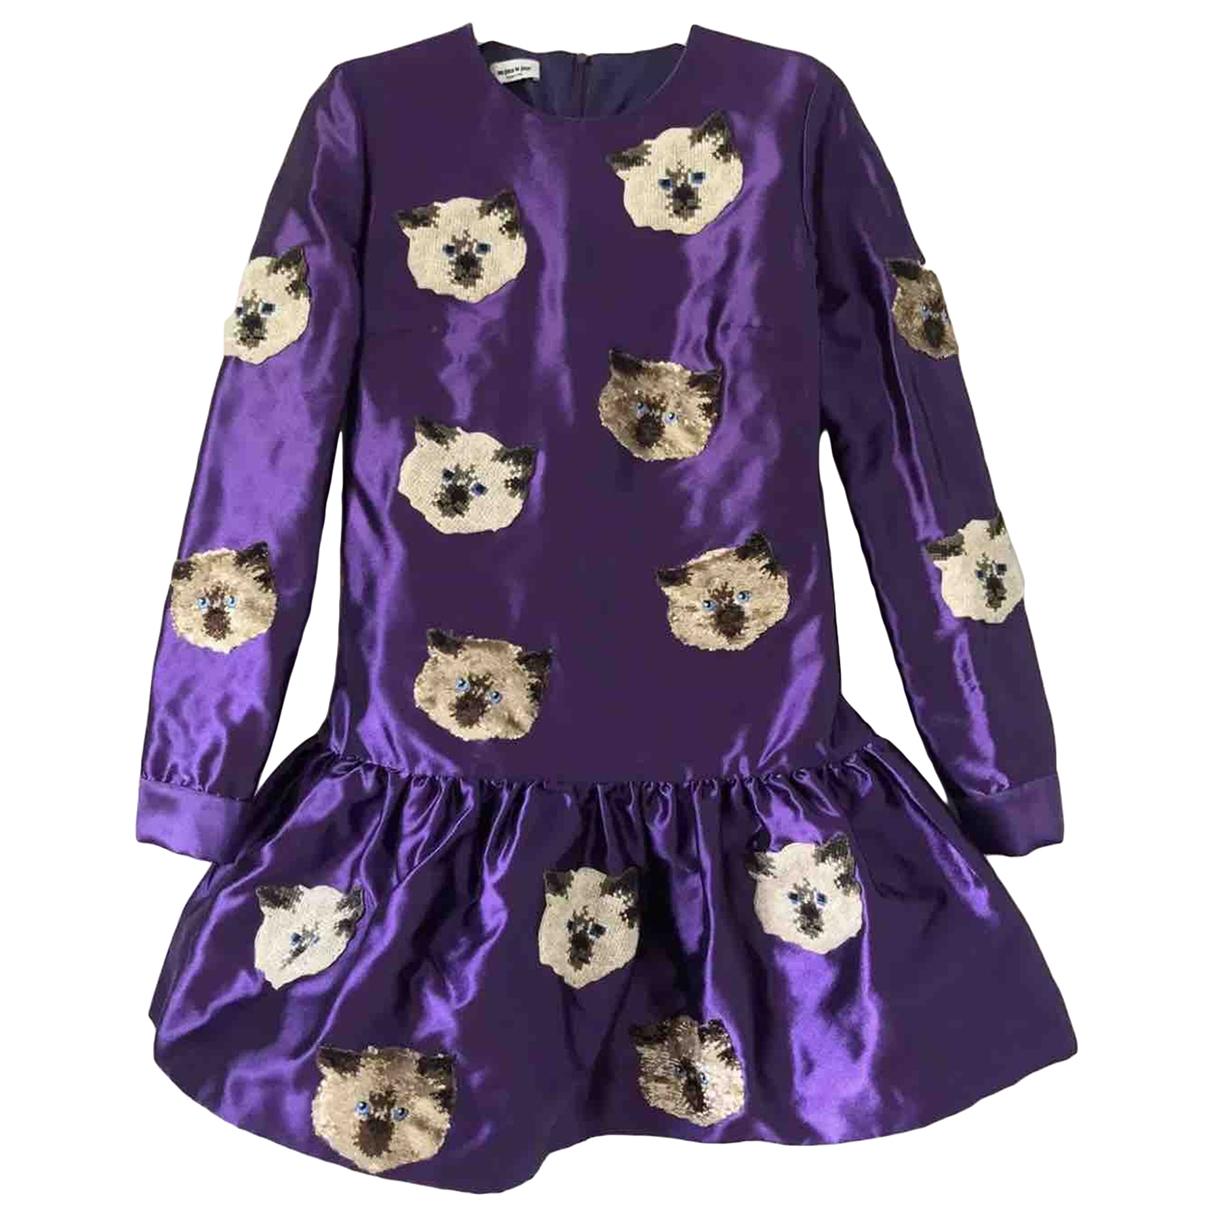 Au Jour Le Jour \N Kleid in  Lila Polyester